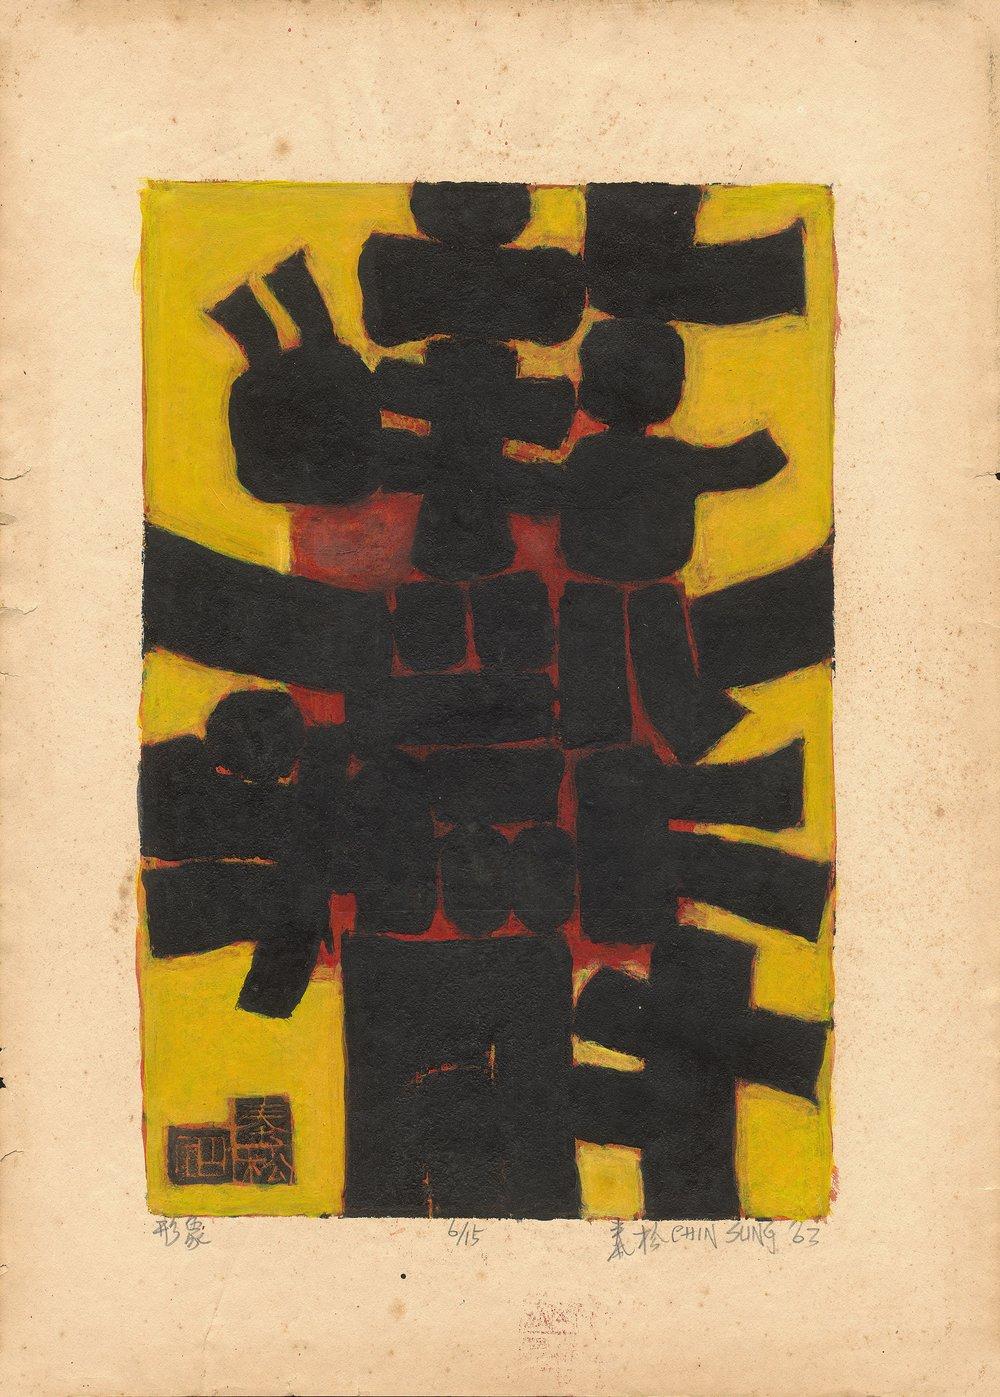 Chin Sung (Taiwanese, 1932 - 2007)